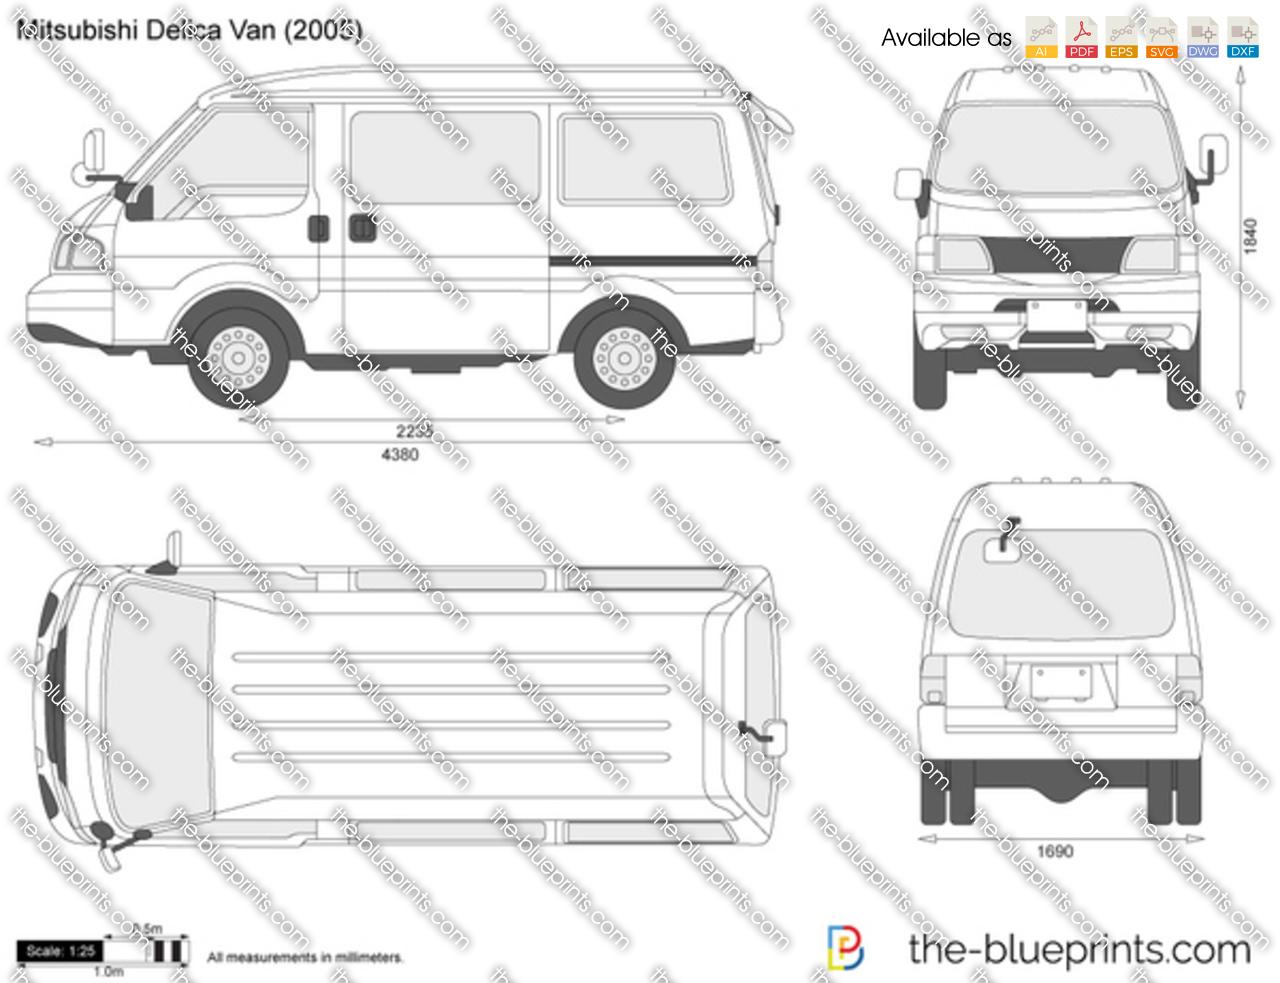 Mitsubishi Delica Van 1995